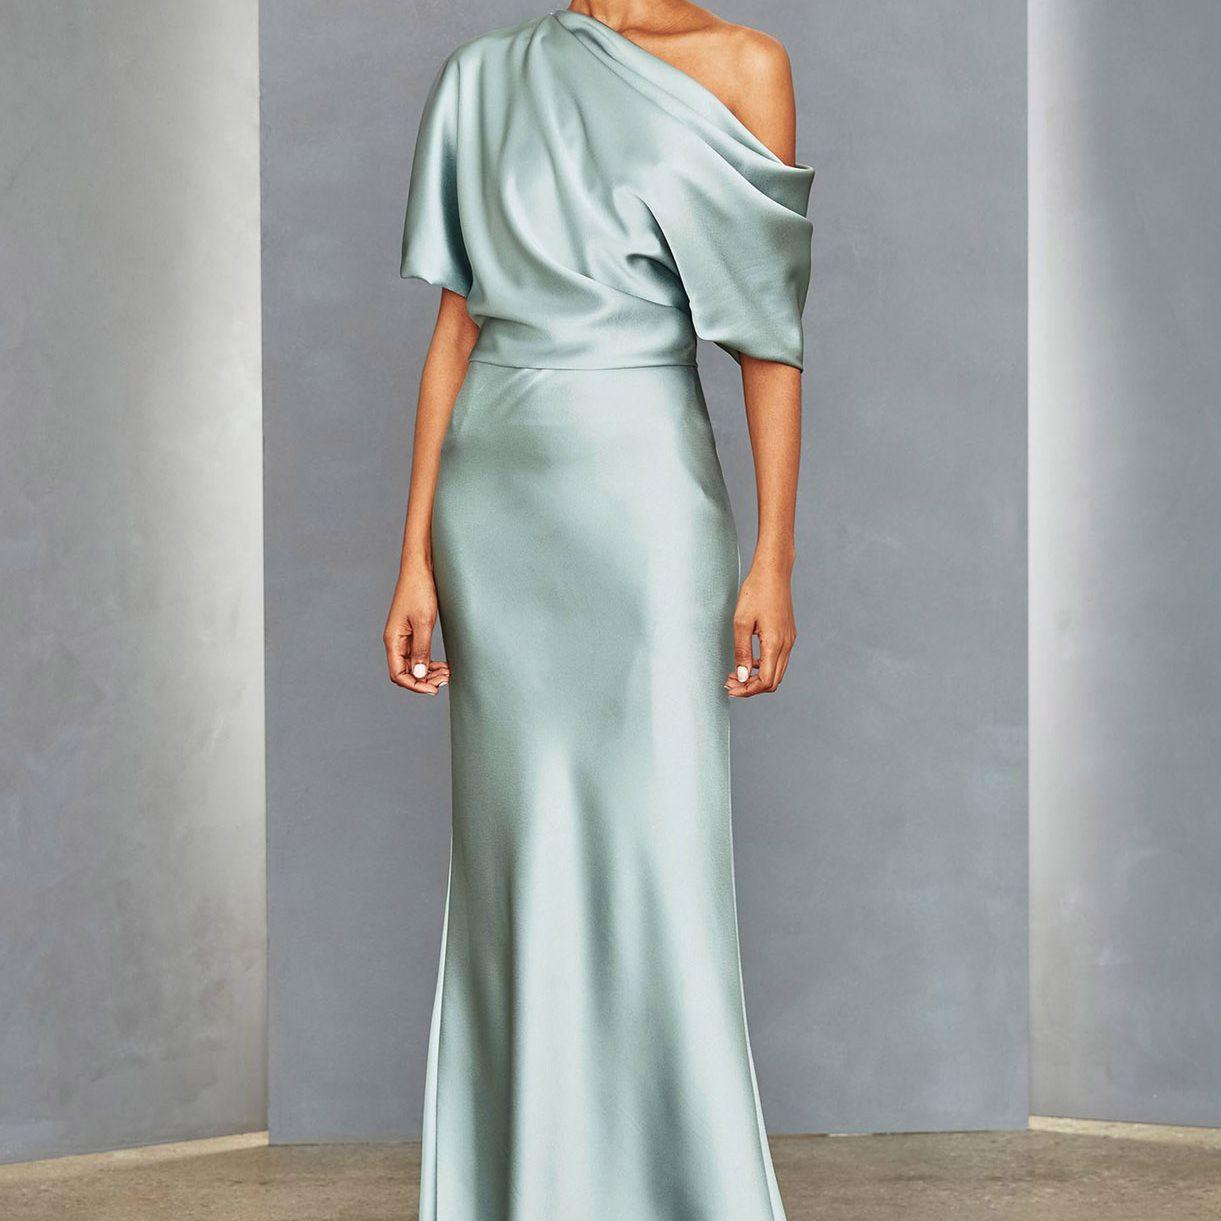 draped blue dress